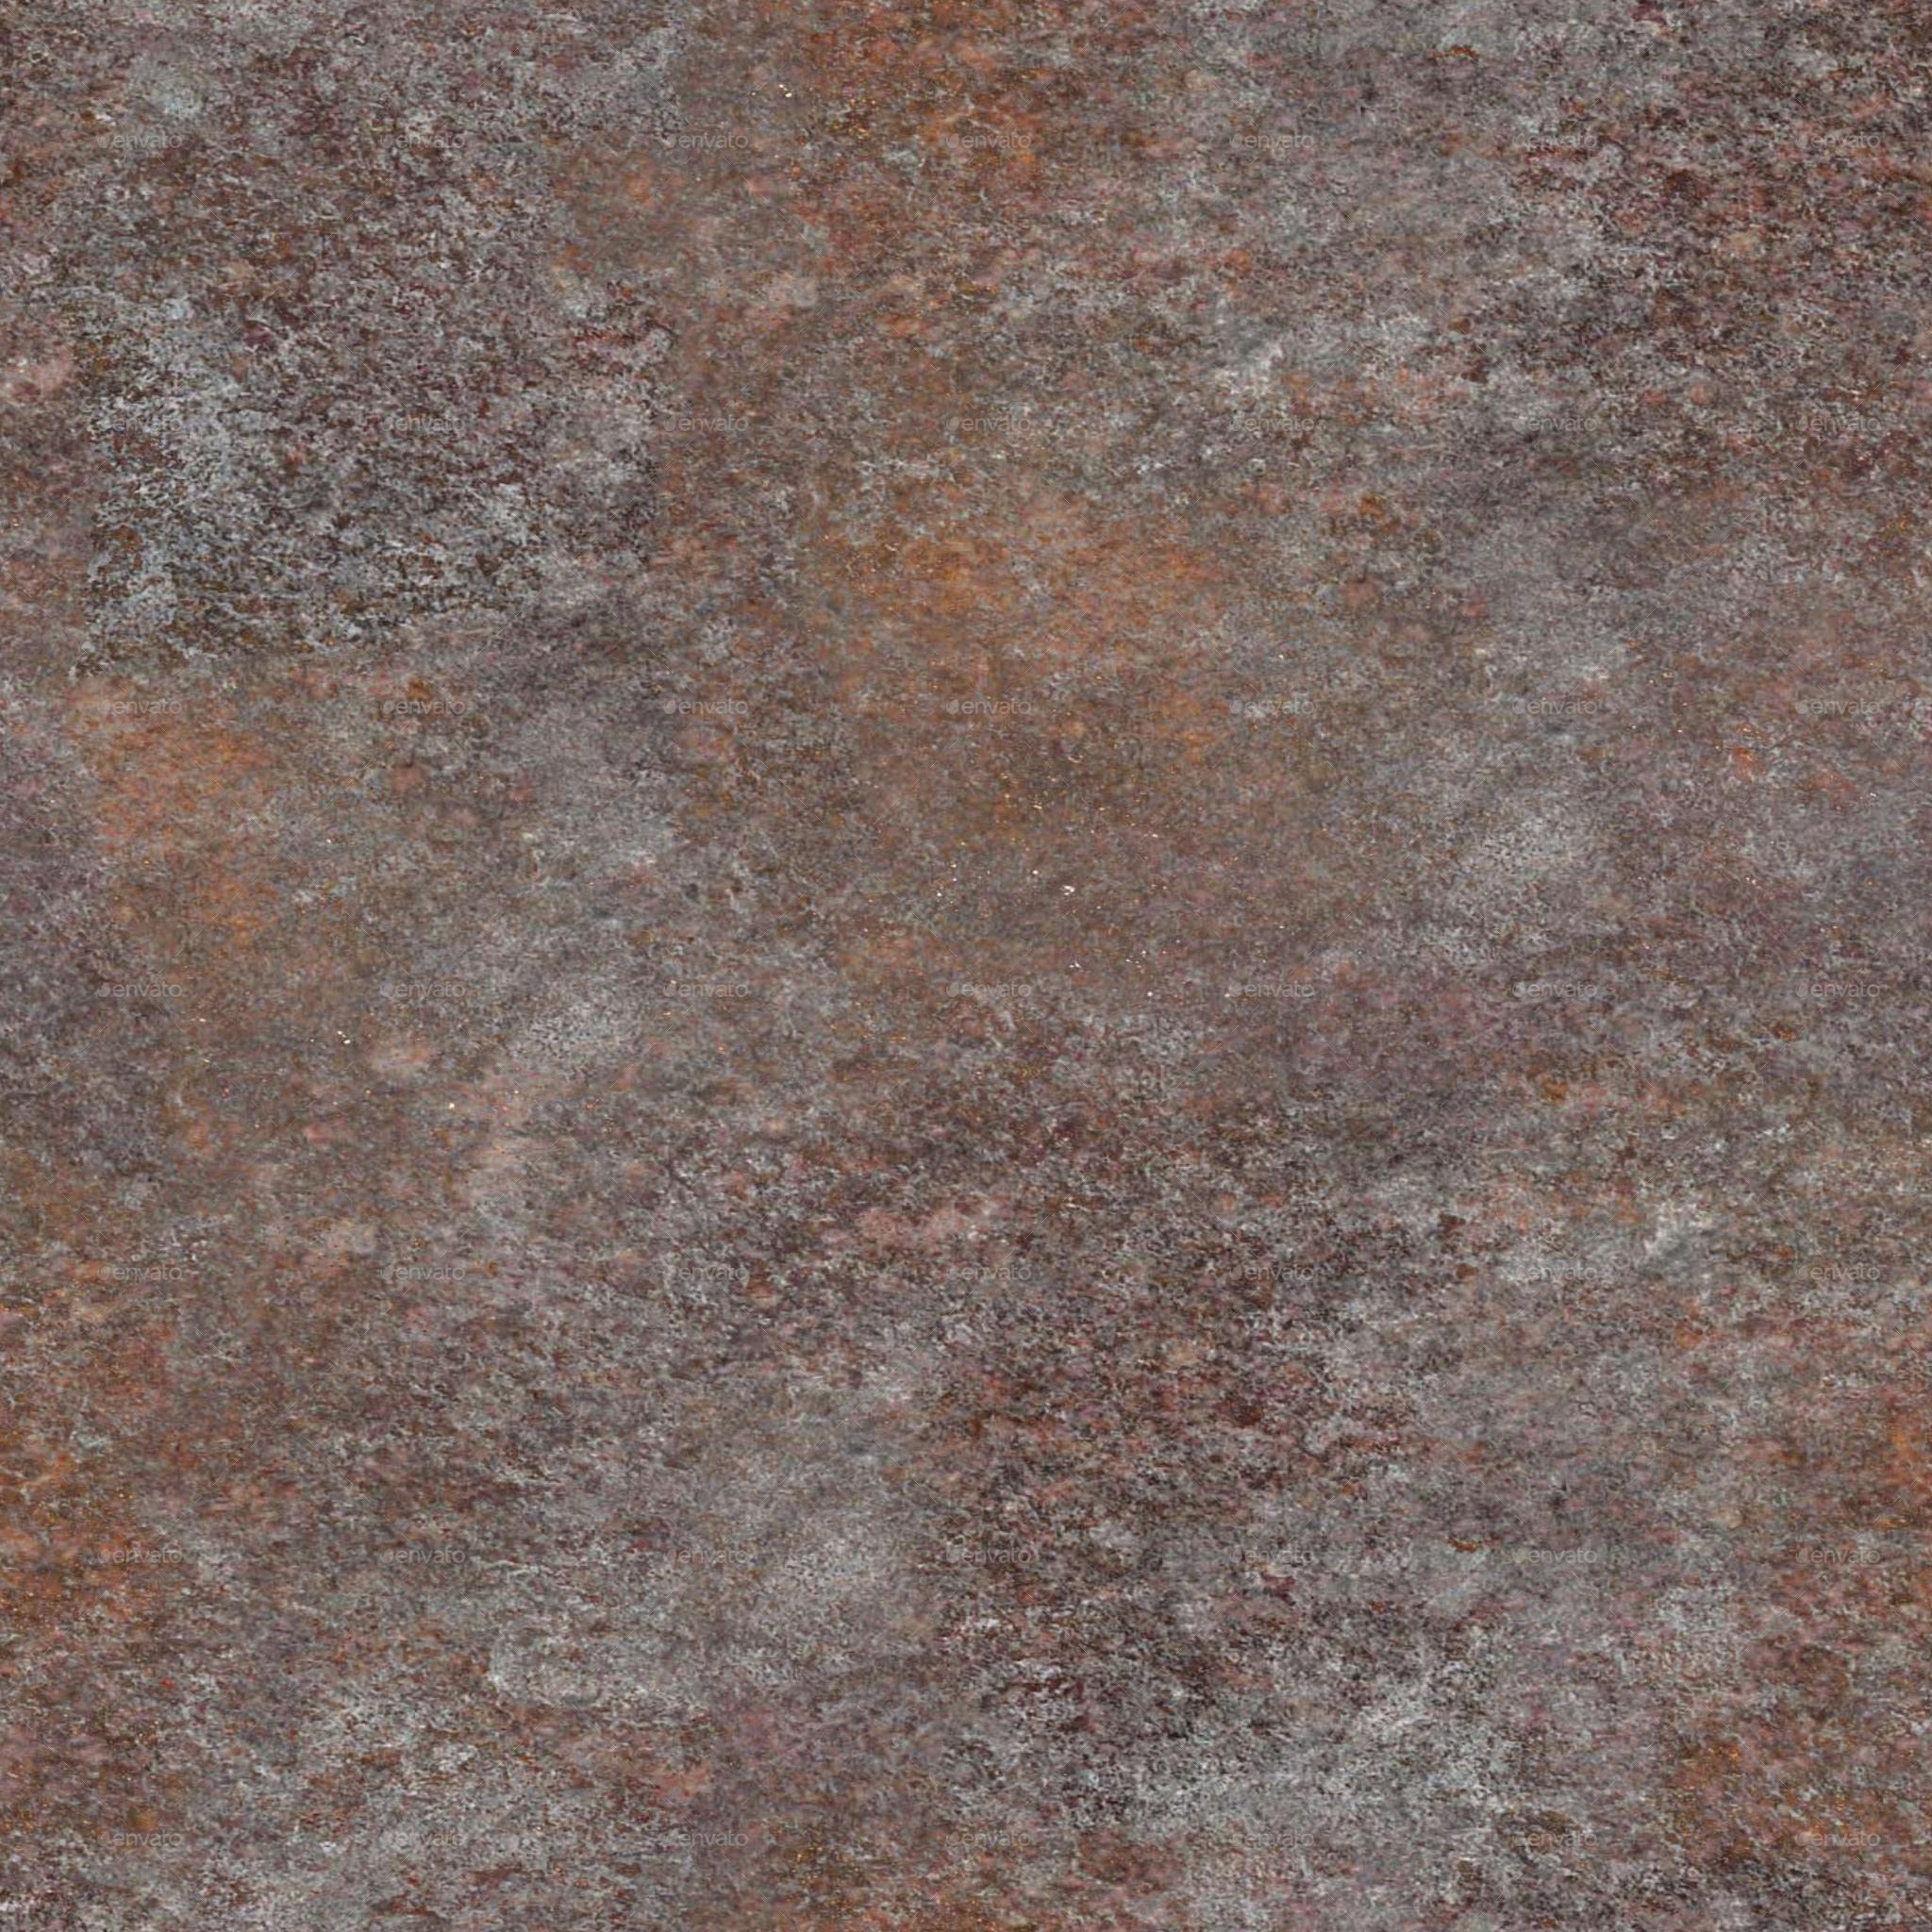 Rusty Metal Seamless Texture Set Volume 1 by ...  Rusty Metal Sea...